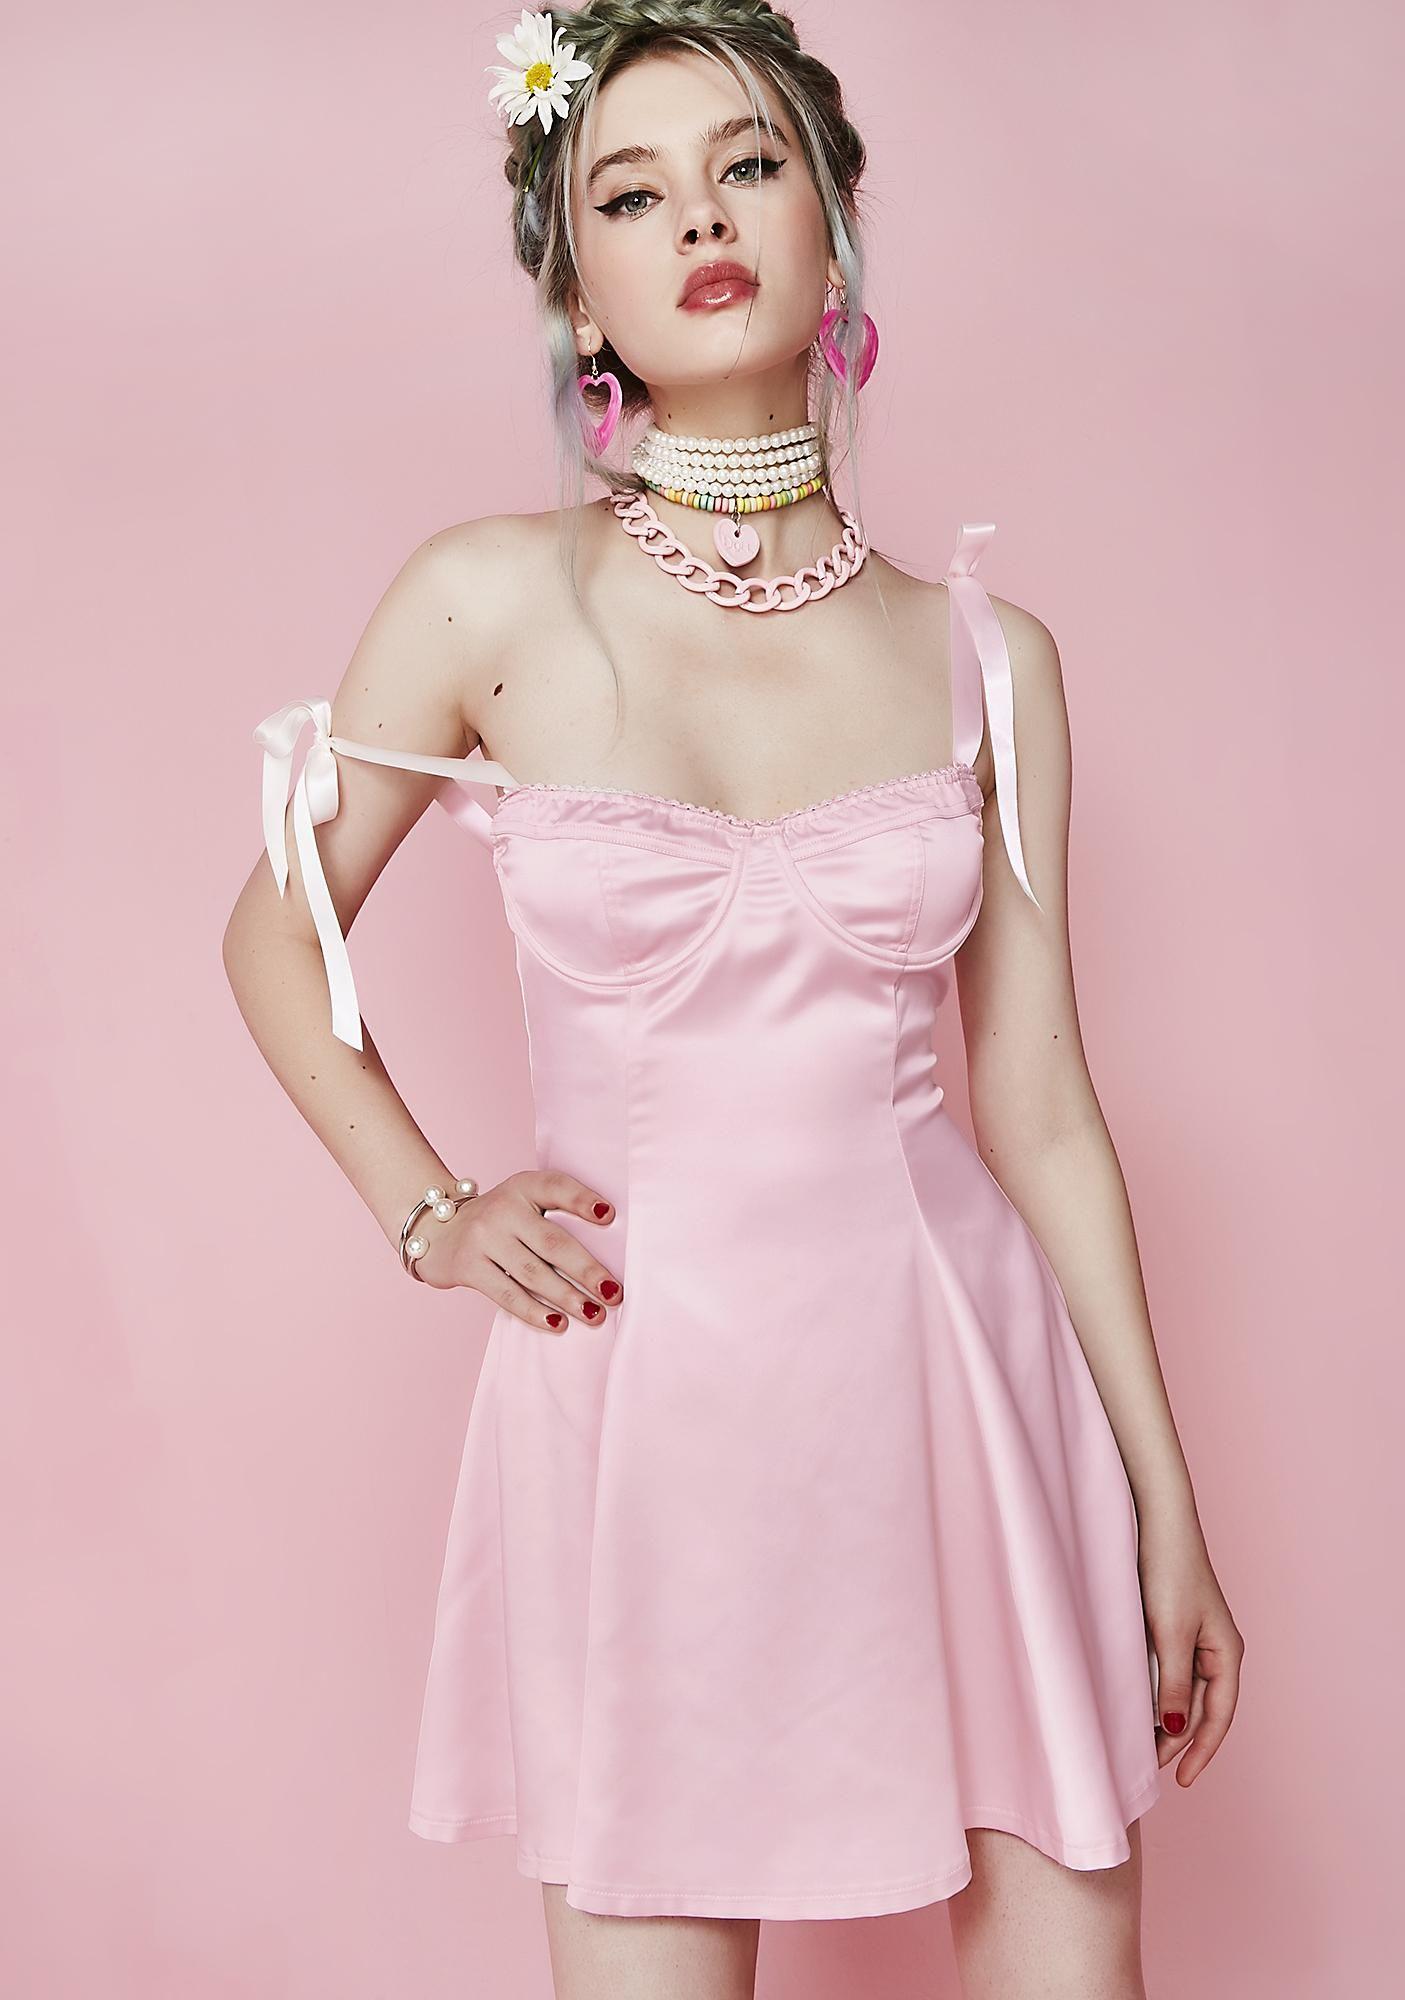 0a4abe6e2816a0 Flirt With Desire Satin Dress